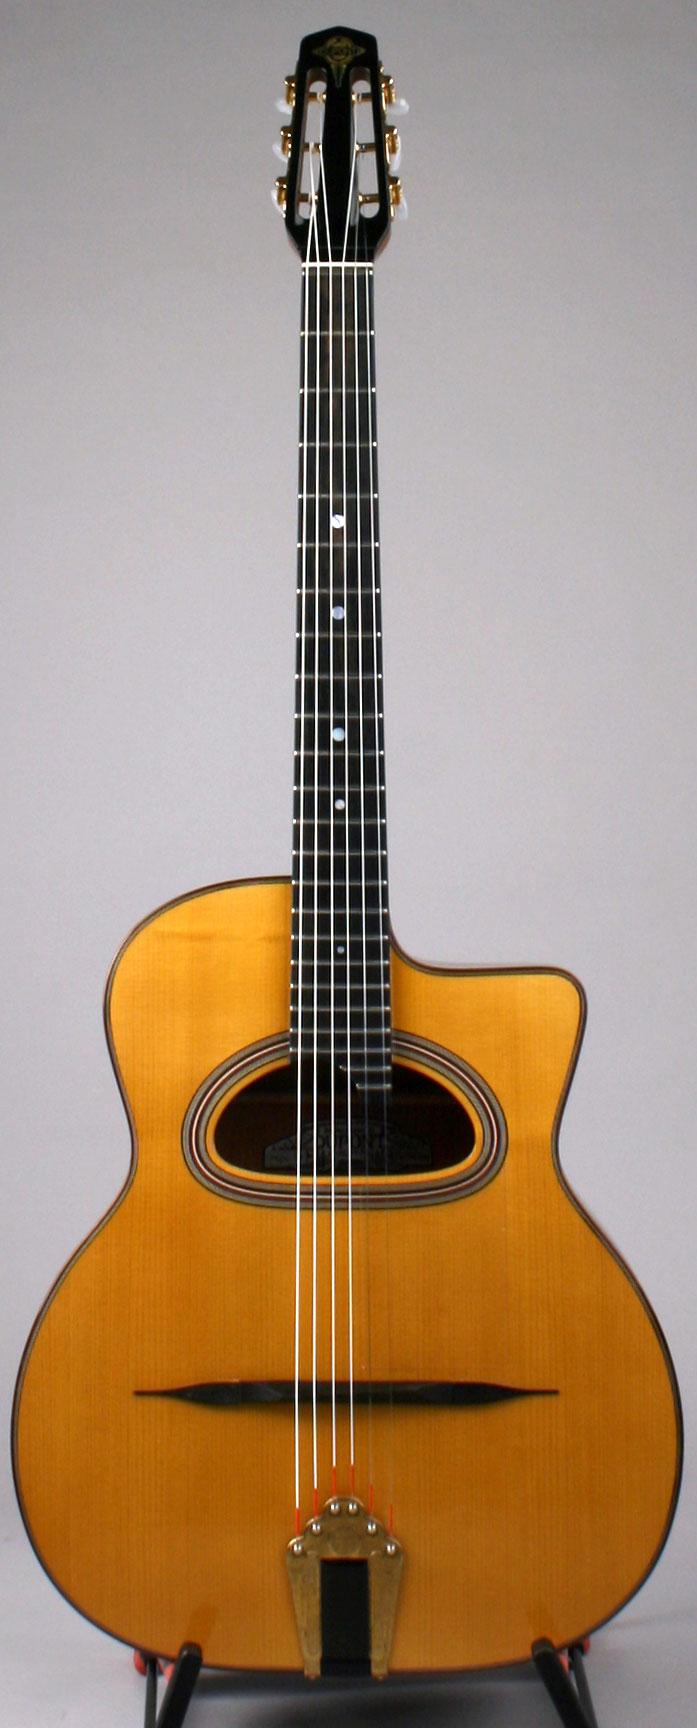 2010 Dupont MDC50